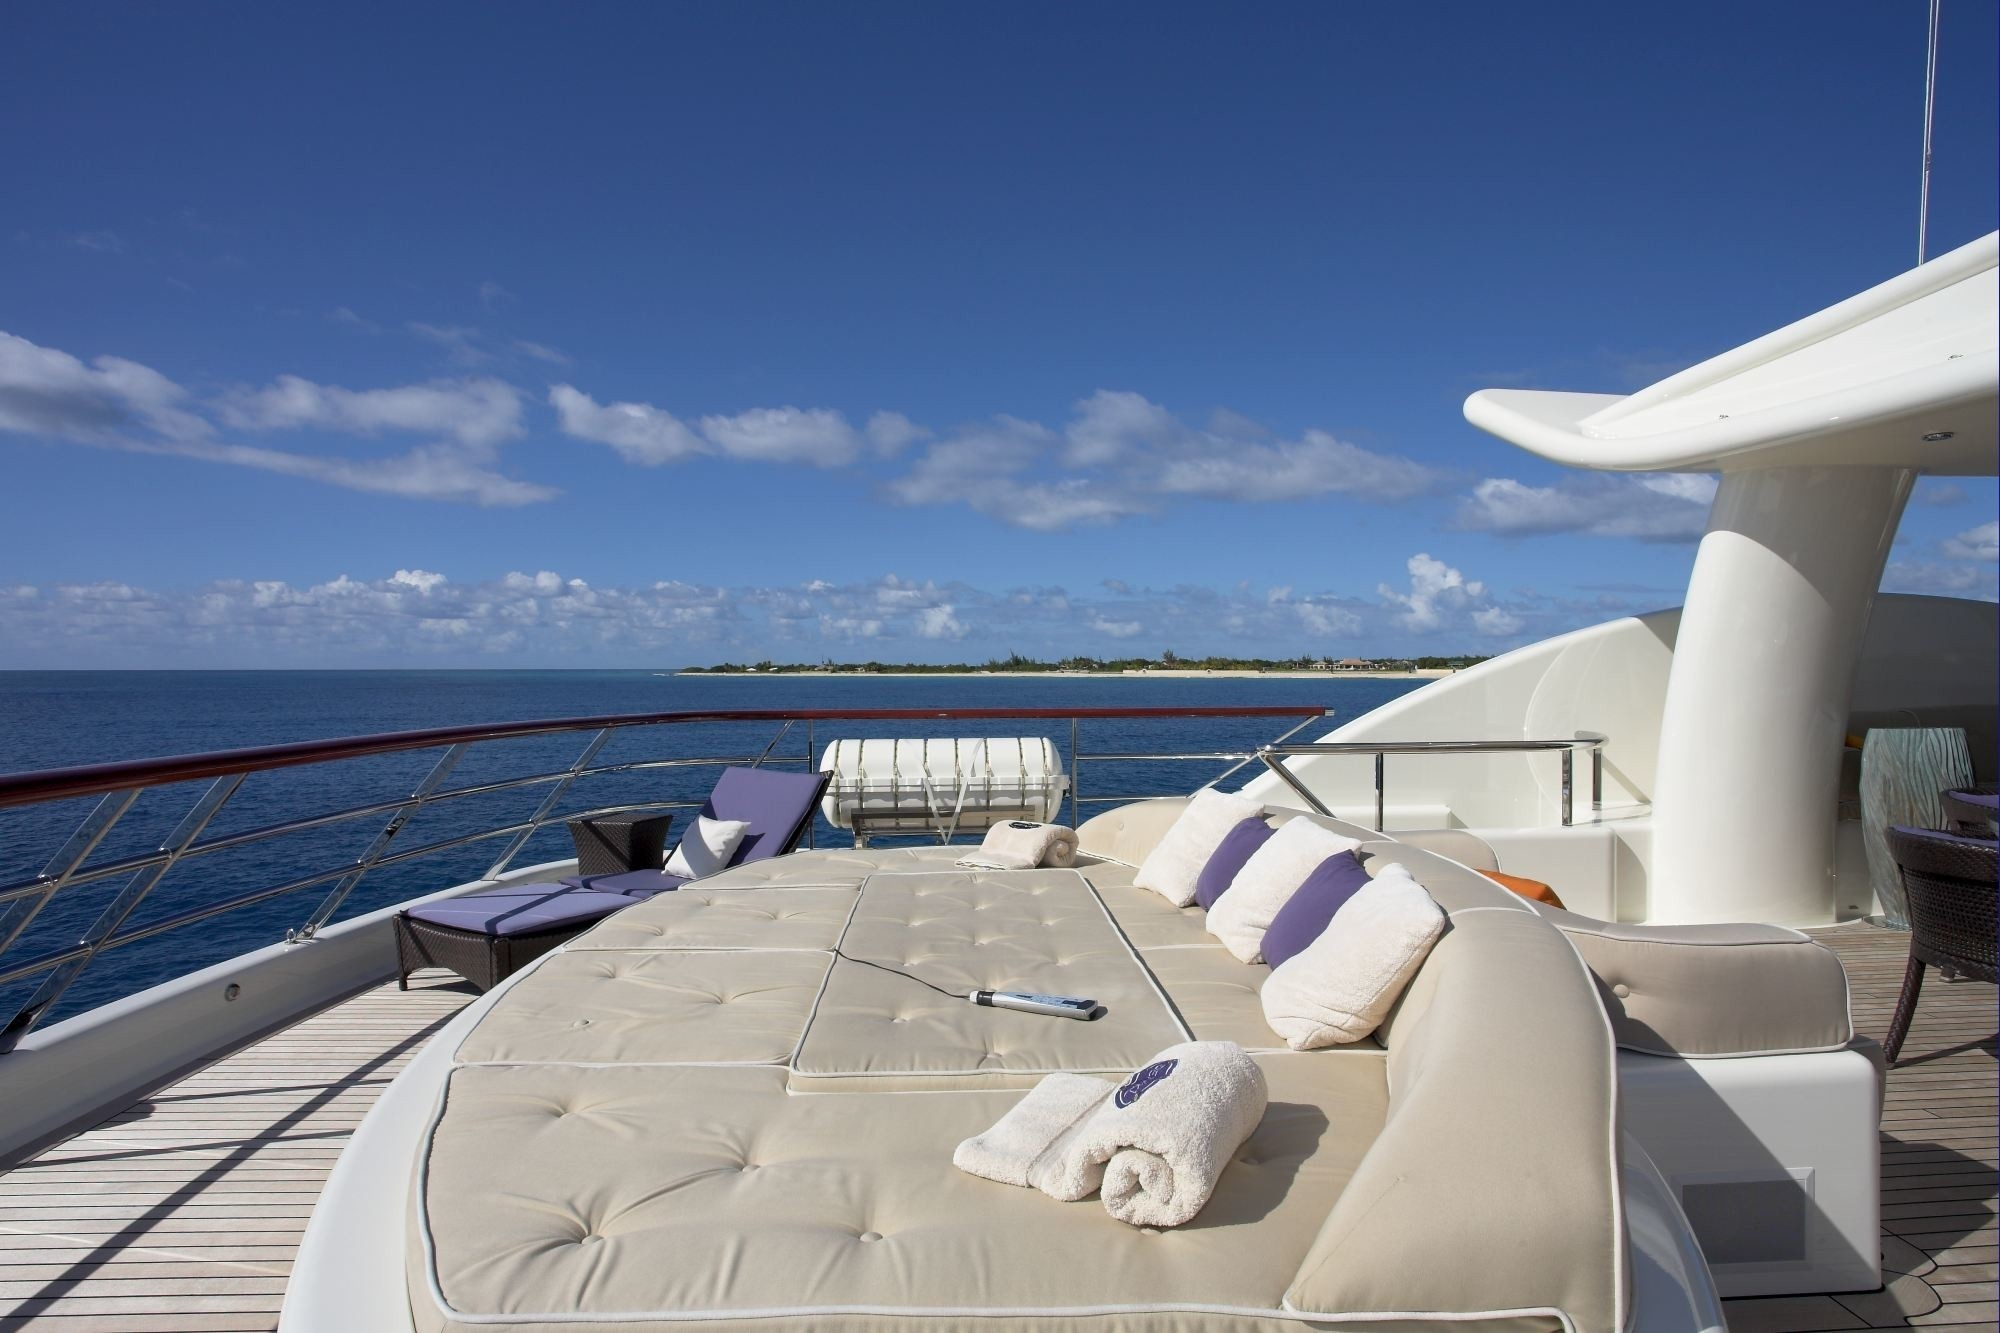 The 52m Yacht DENIKI